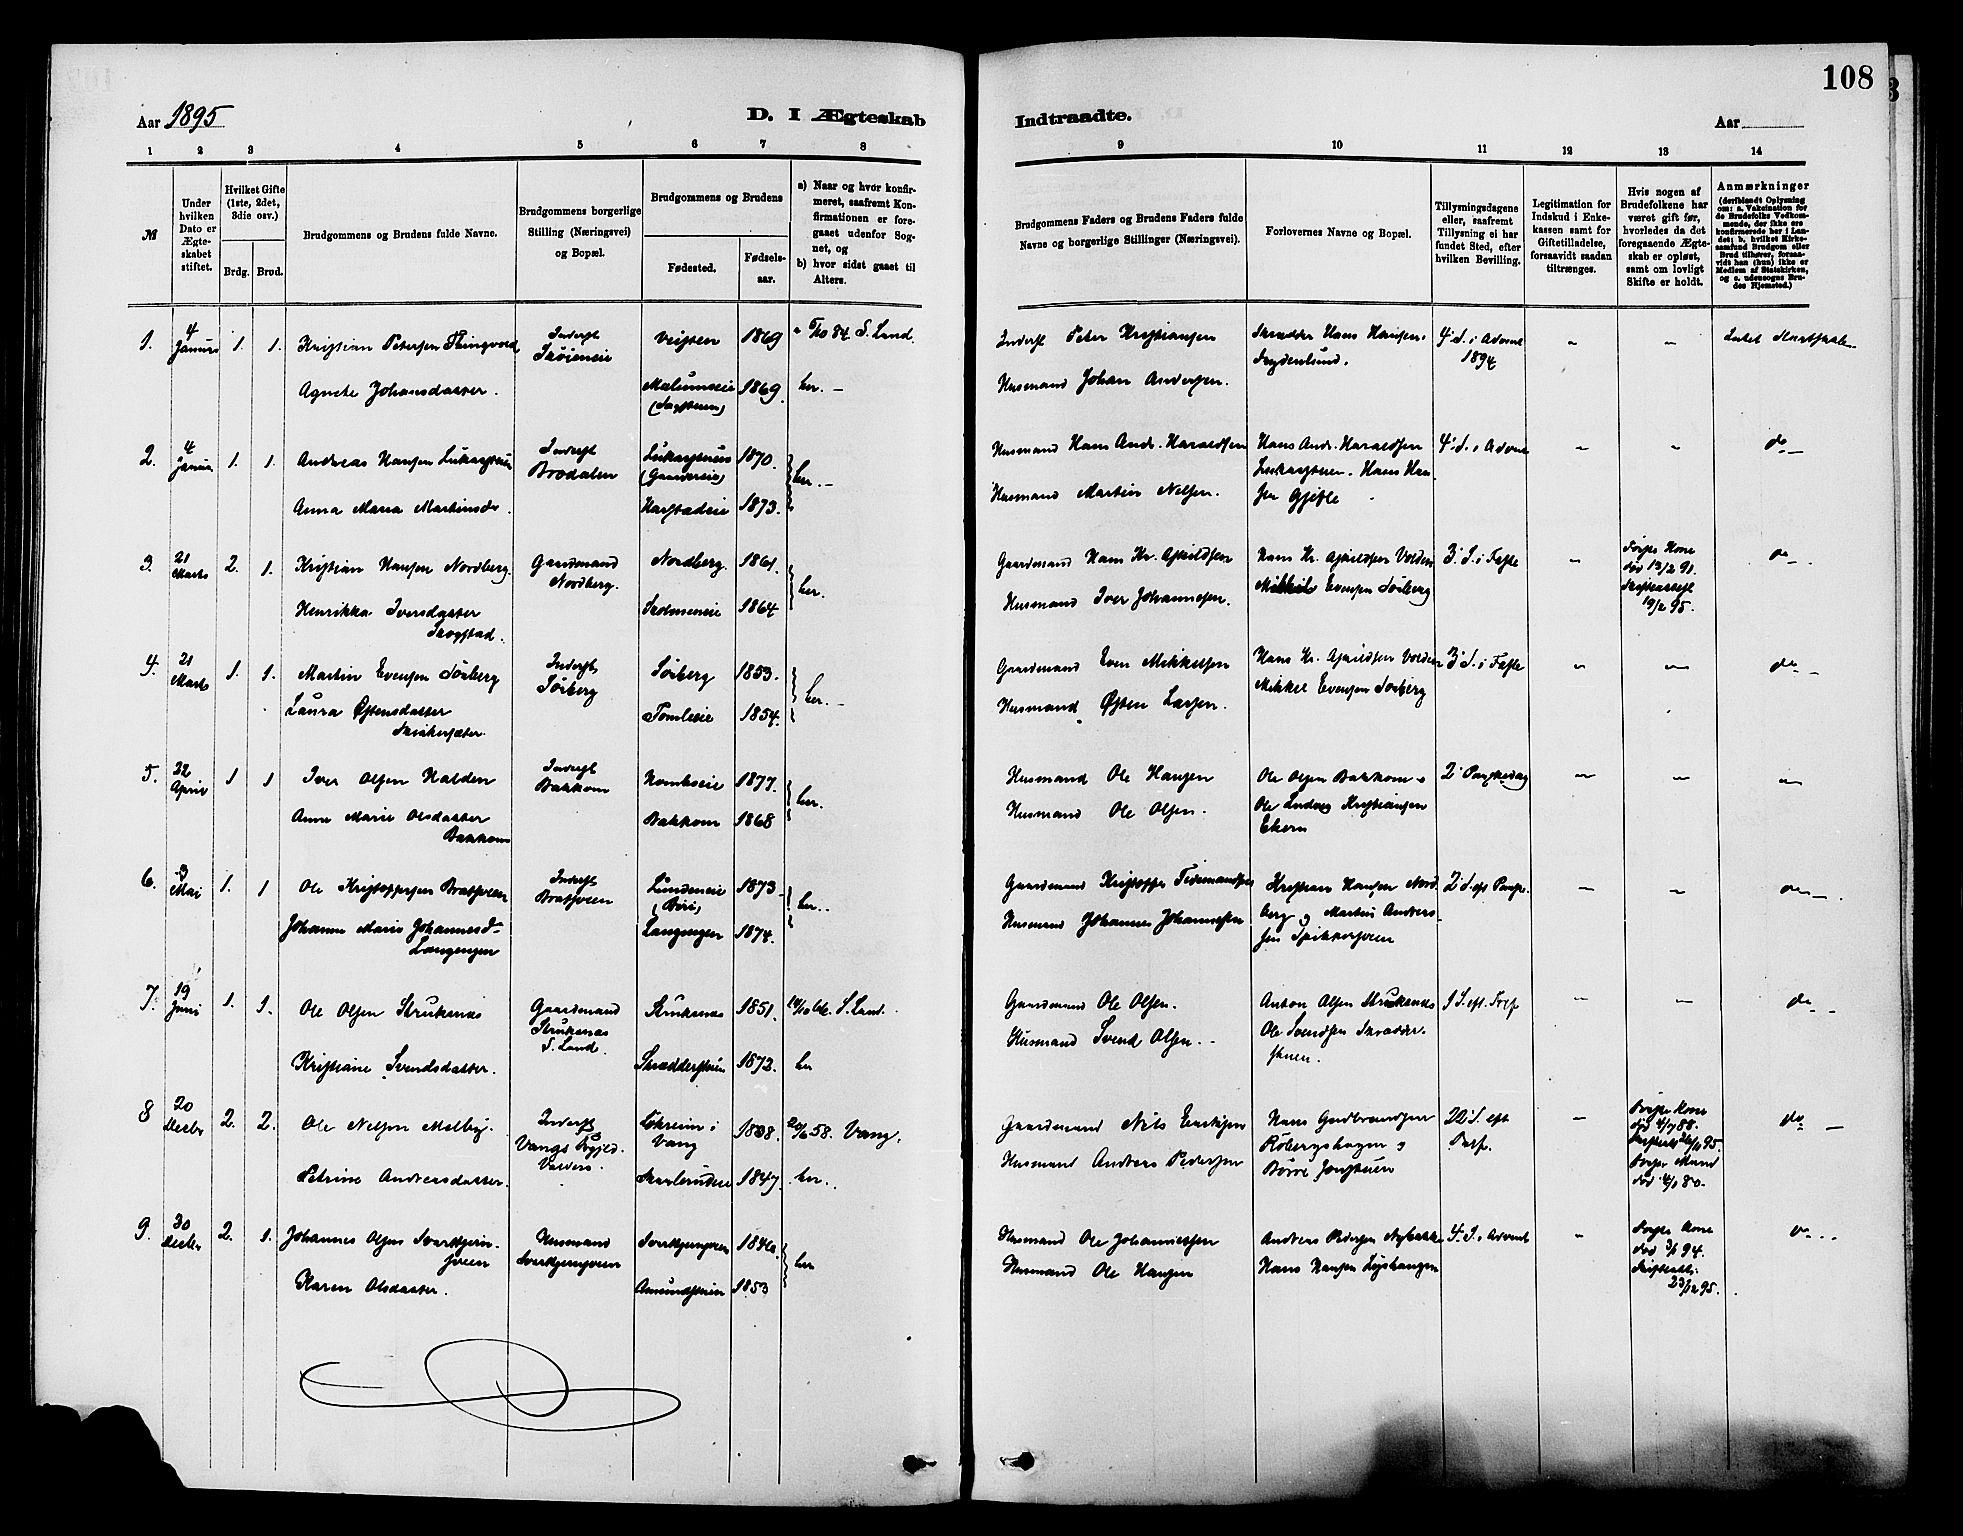 SAH, Nordre Land prestekontor, Ministerialbok nr. 3, 1882-1896, s. 108